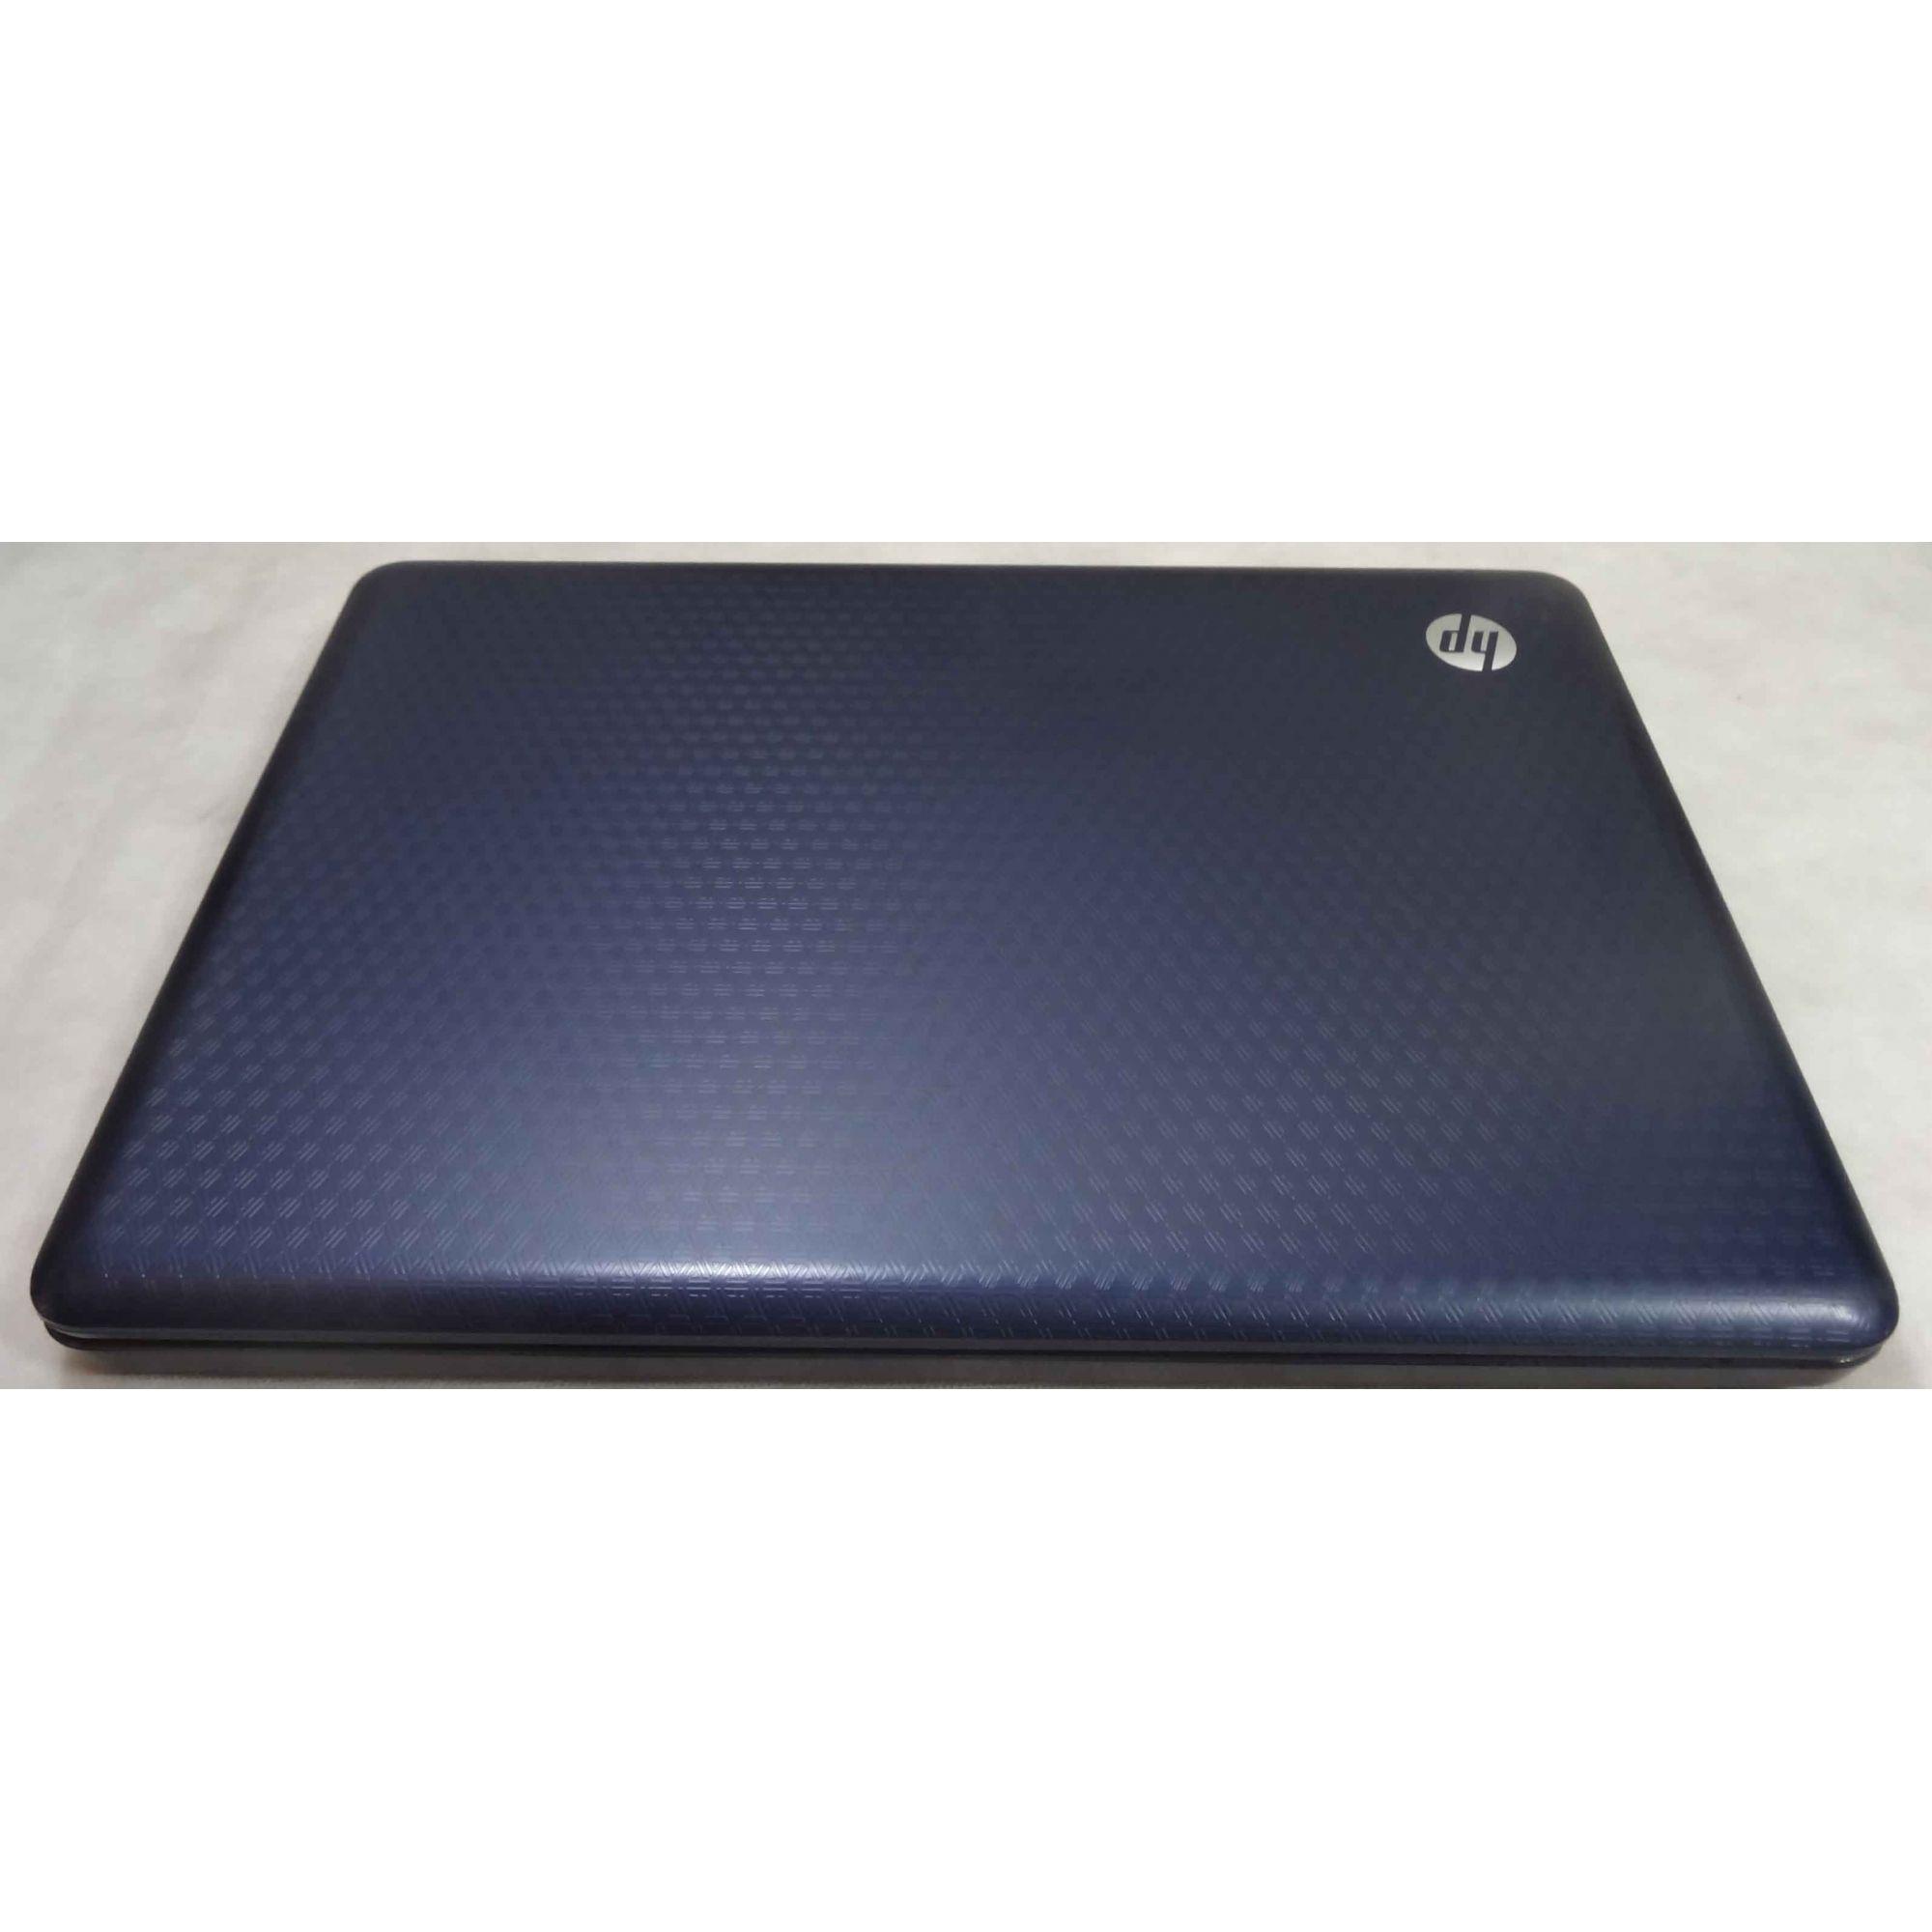 Notebook HP G42 14'' Intel Core i5 2.5GHz 4GB HD-320GB